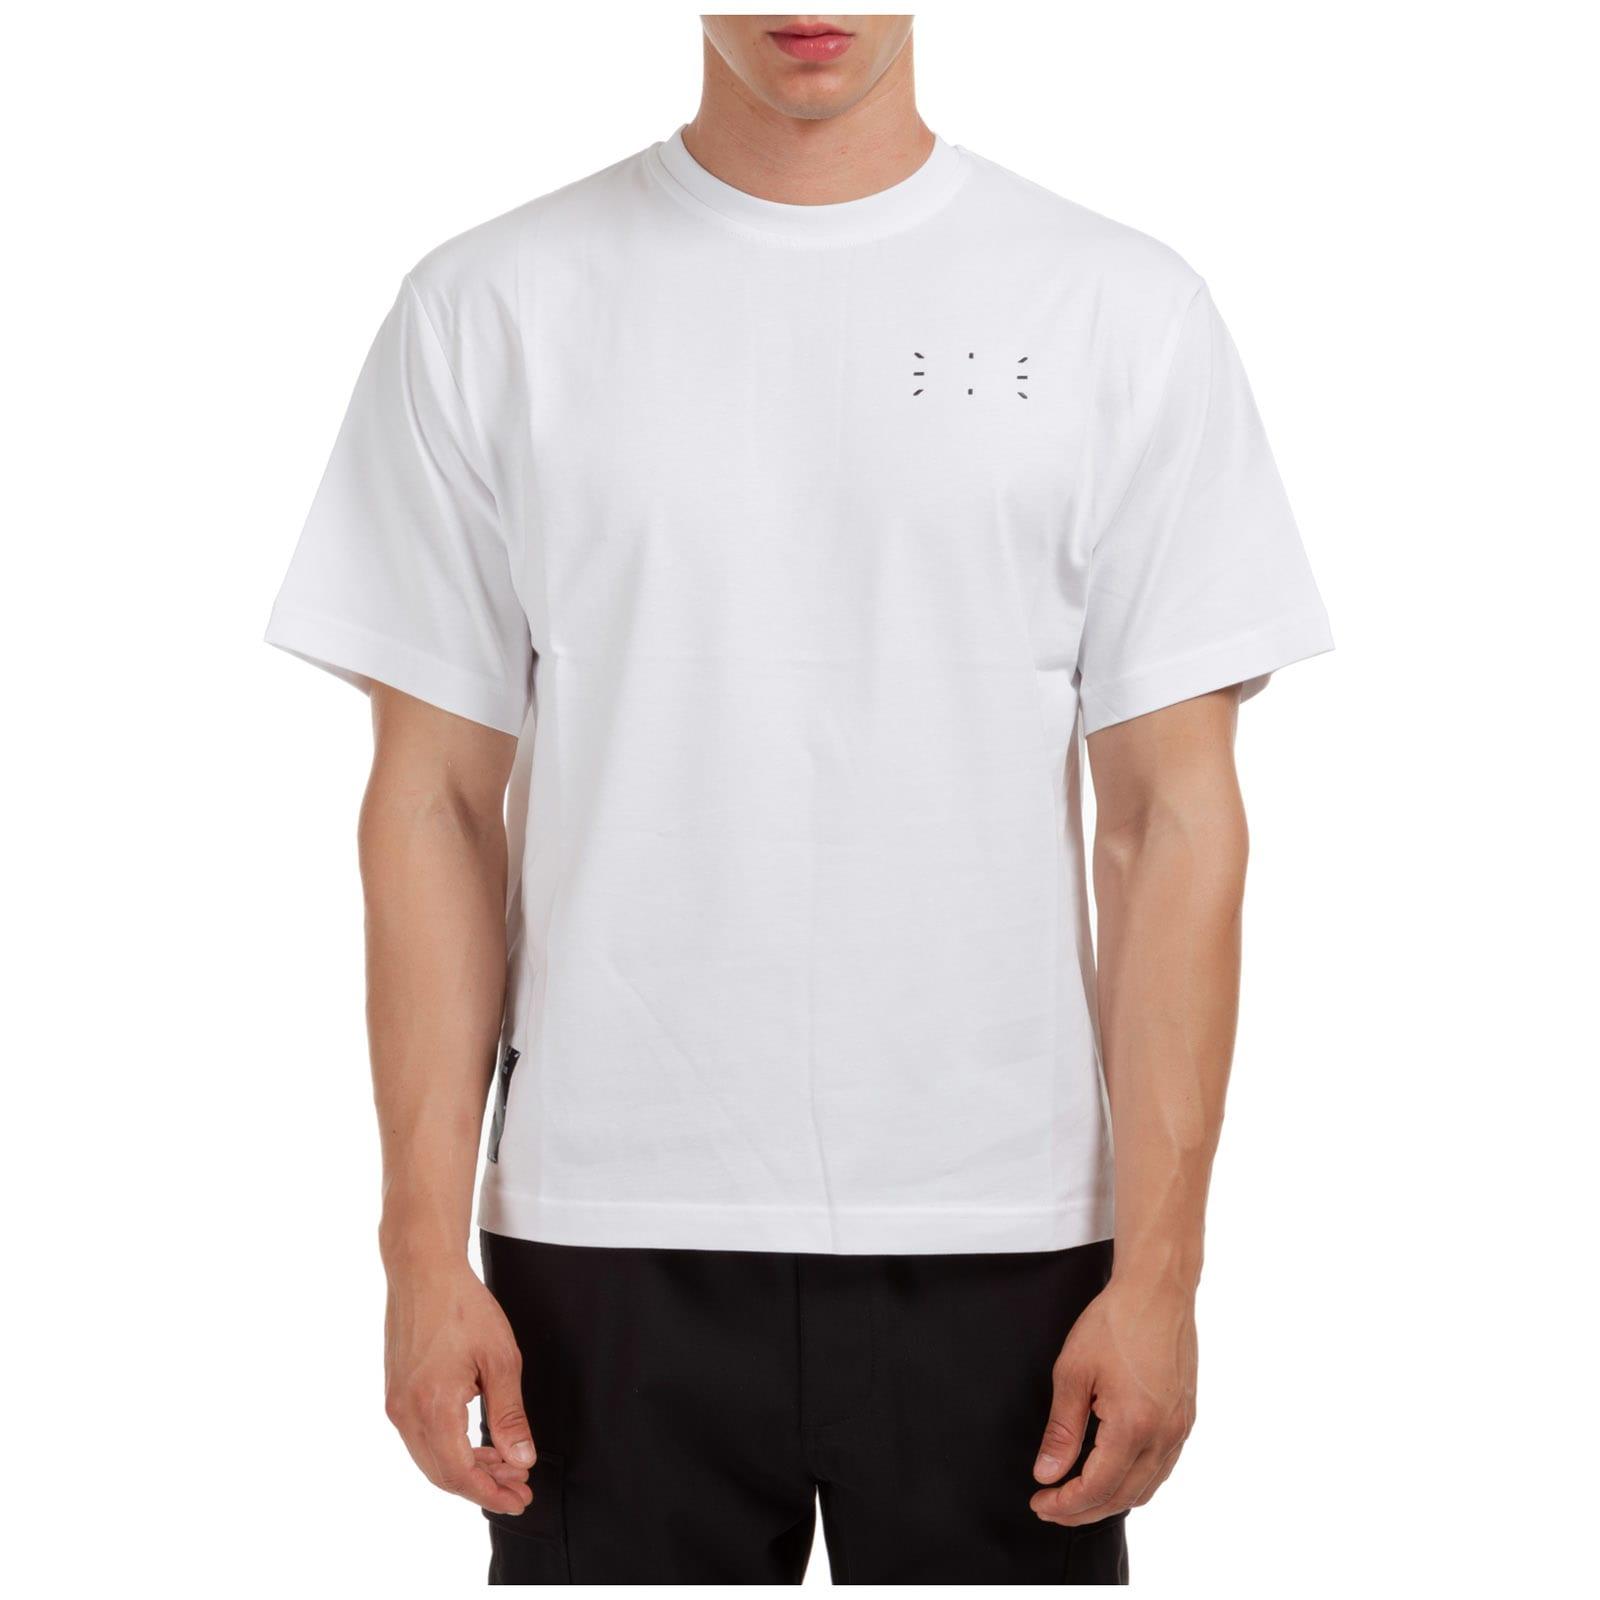 McQ Alexander McQueen Mcq Genesis Ii T-shirt